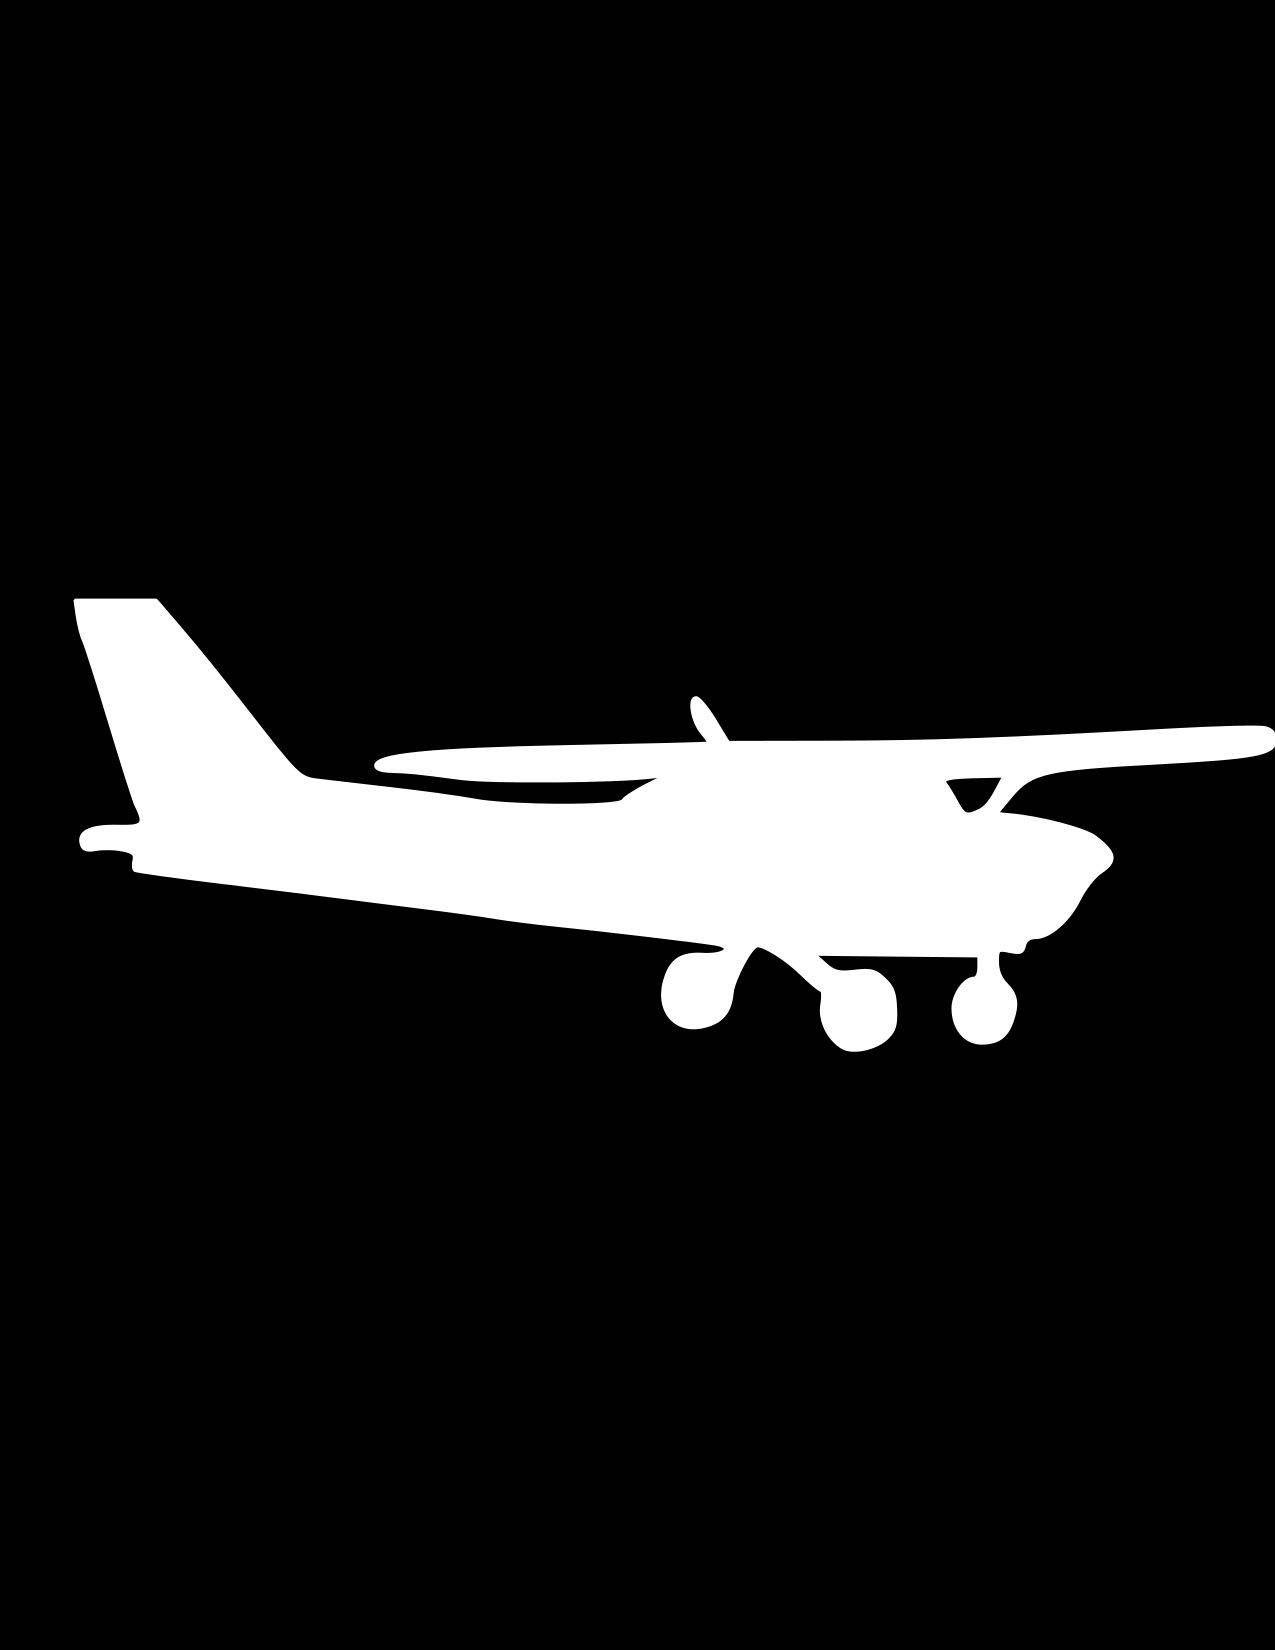 Aviator Pilot Decal Cessna Car Decal Aviation Travel Airplane